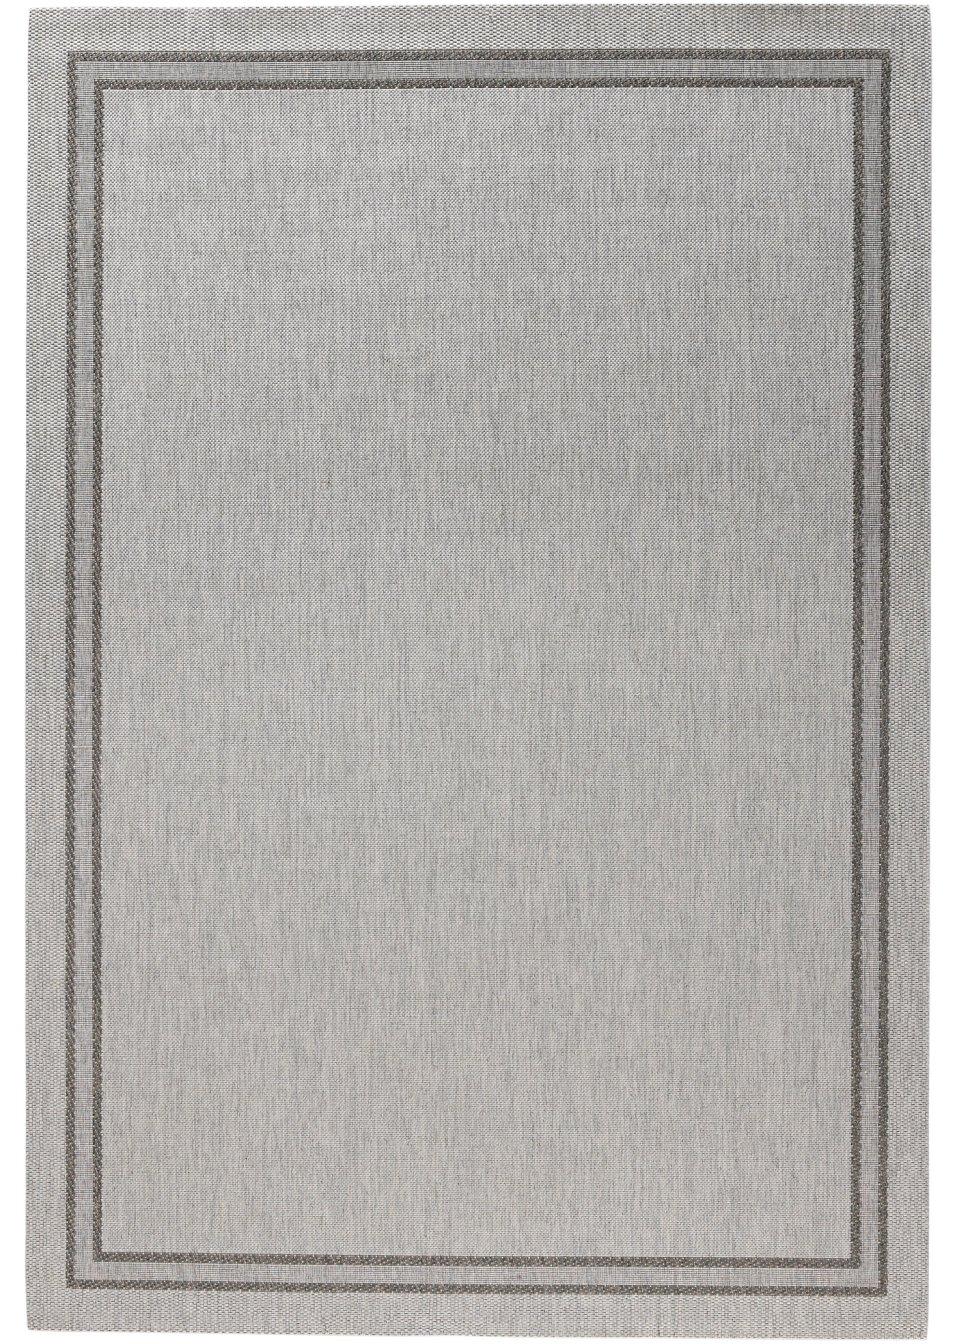 tapis elba gris clair bpc living acheter online. Black Bedroom Furniture Sets. Home Design Ideas